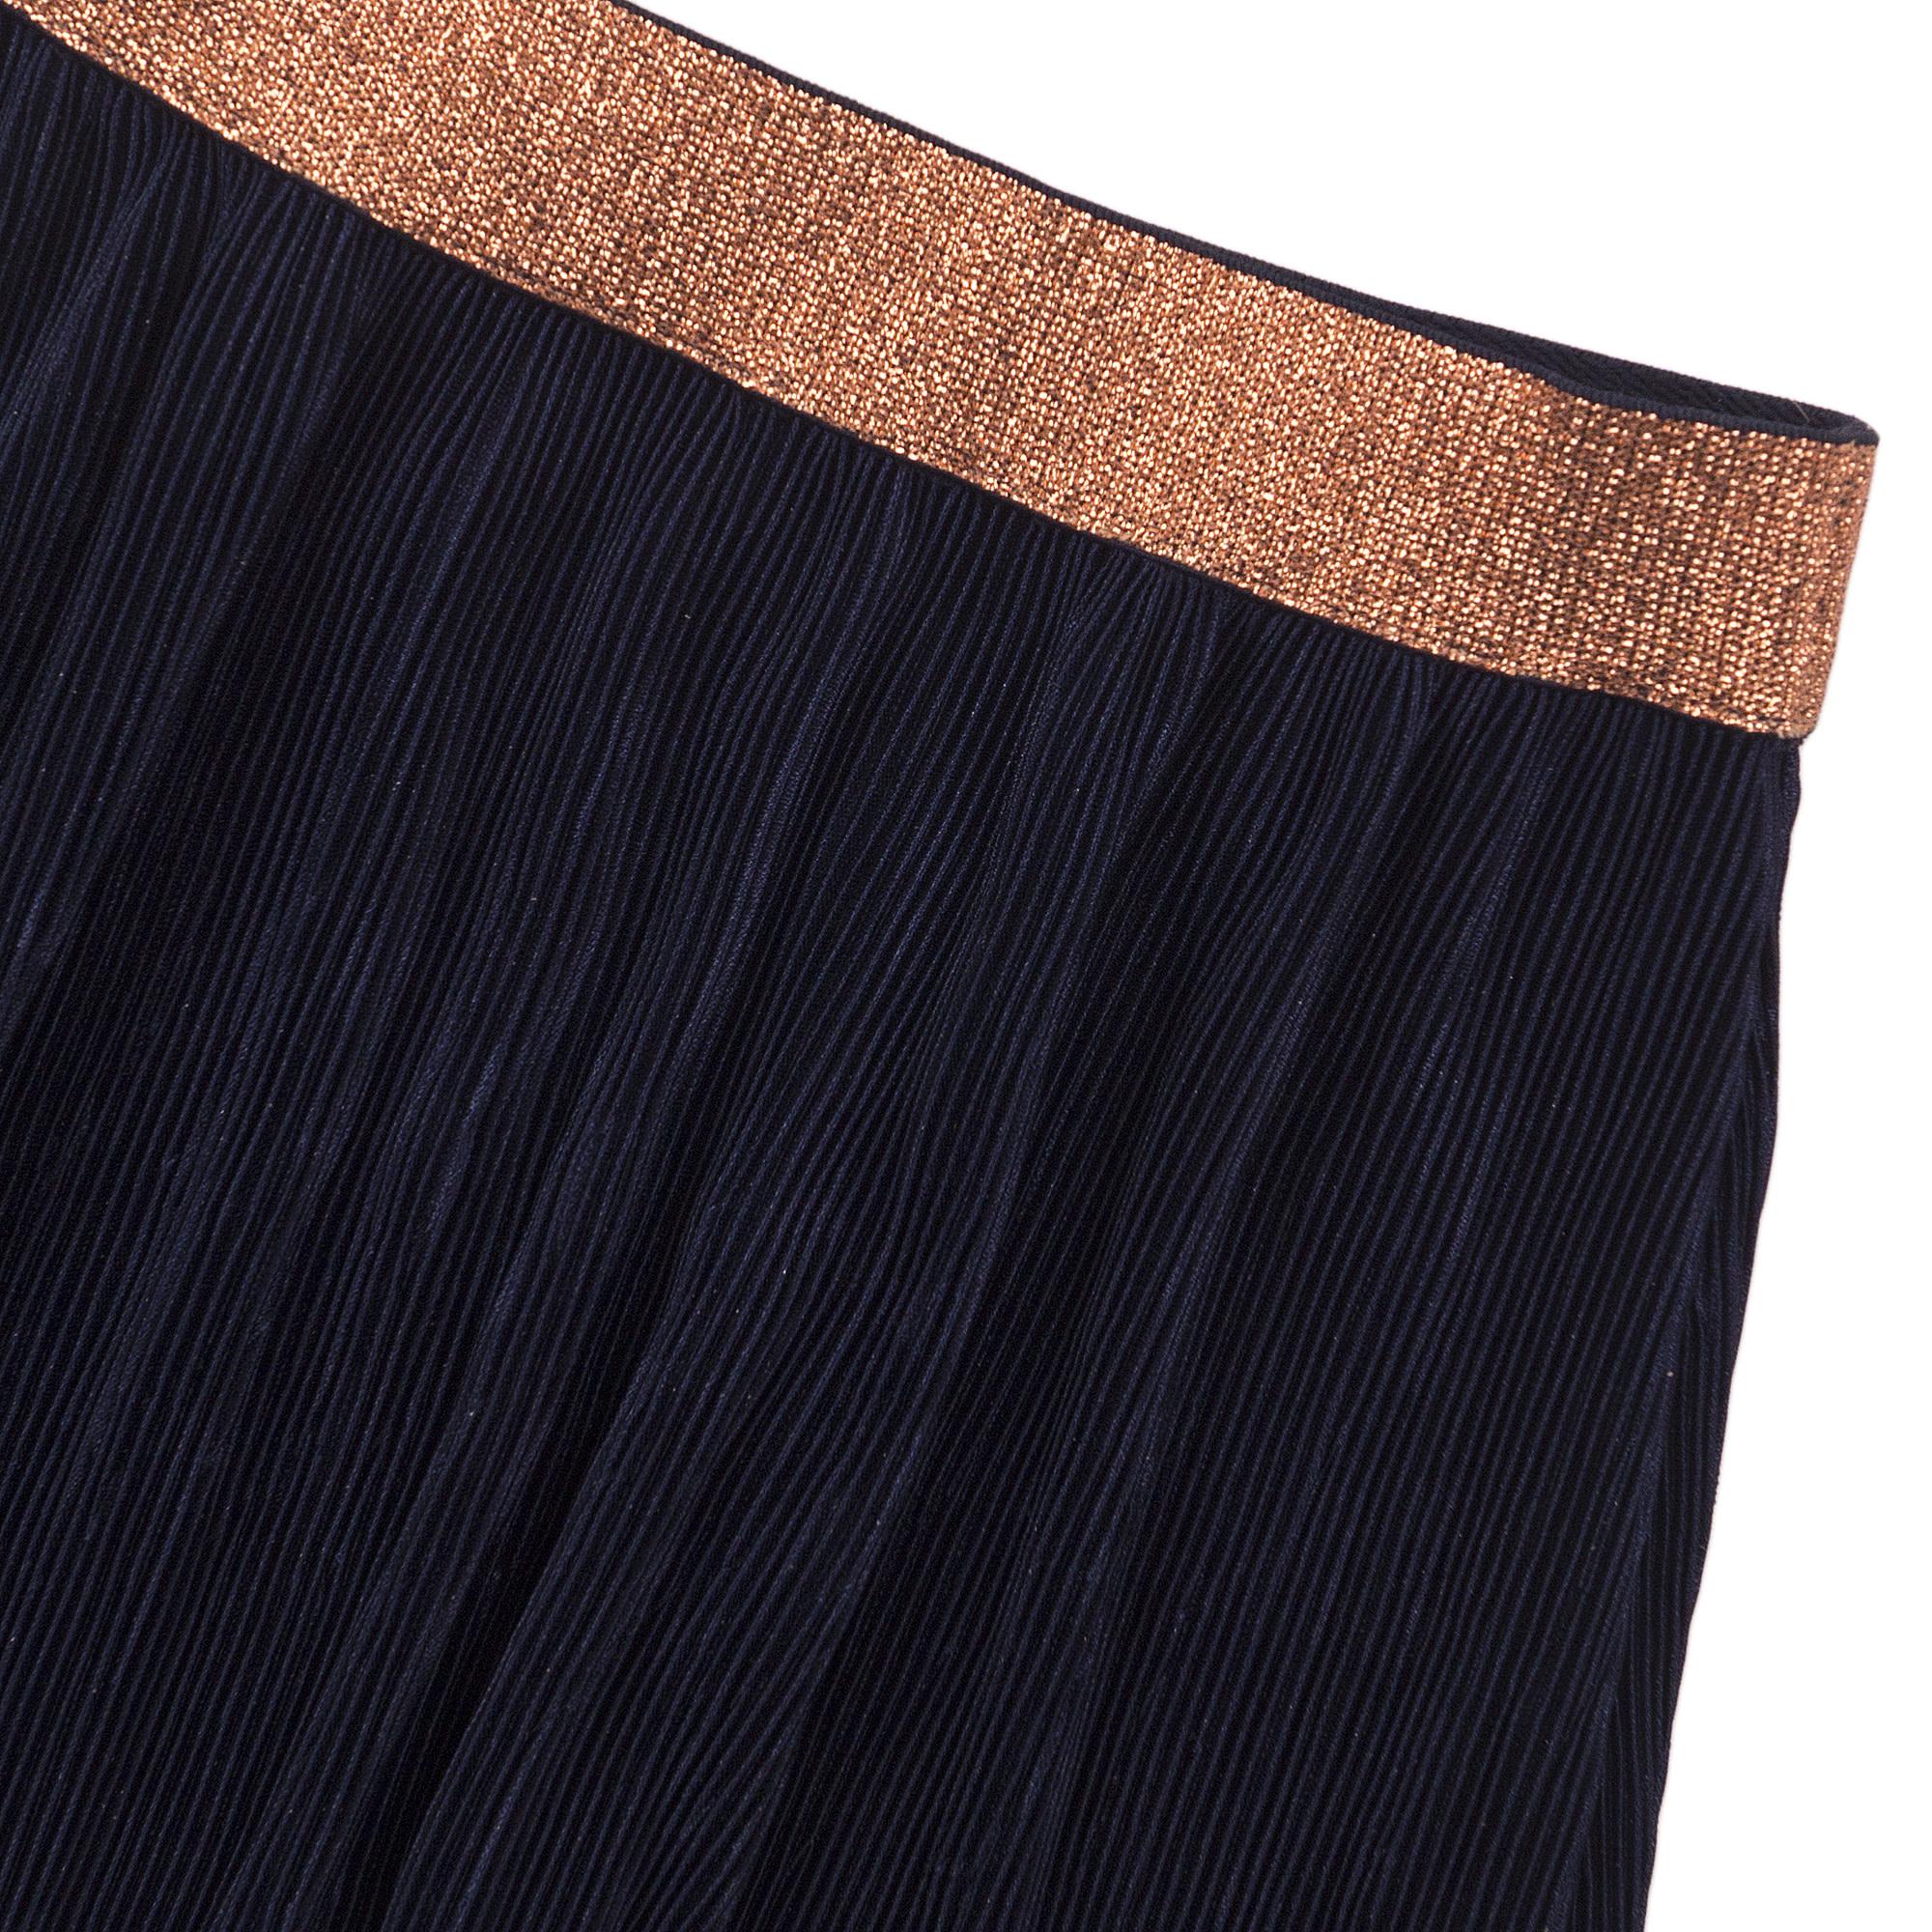 L'Amour Skirt